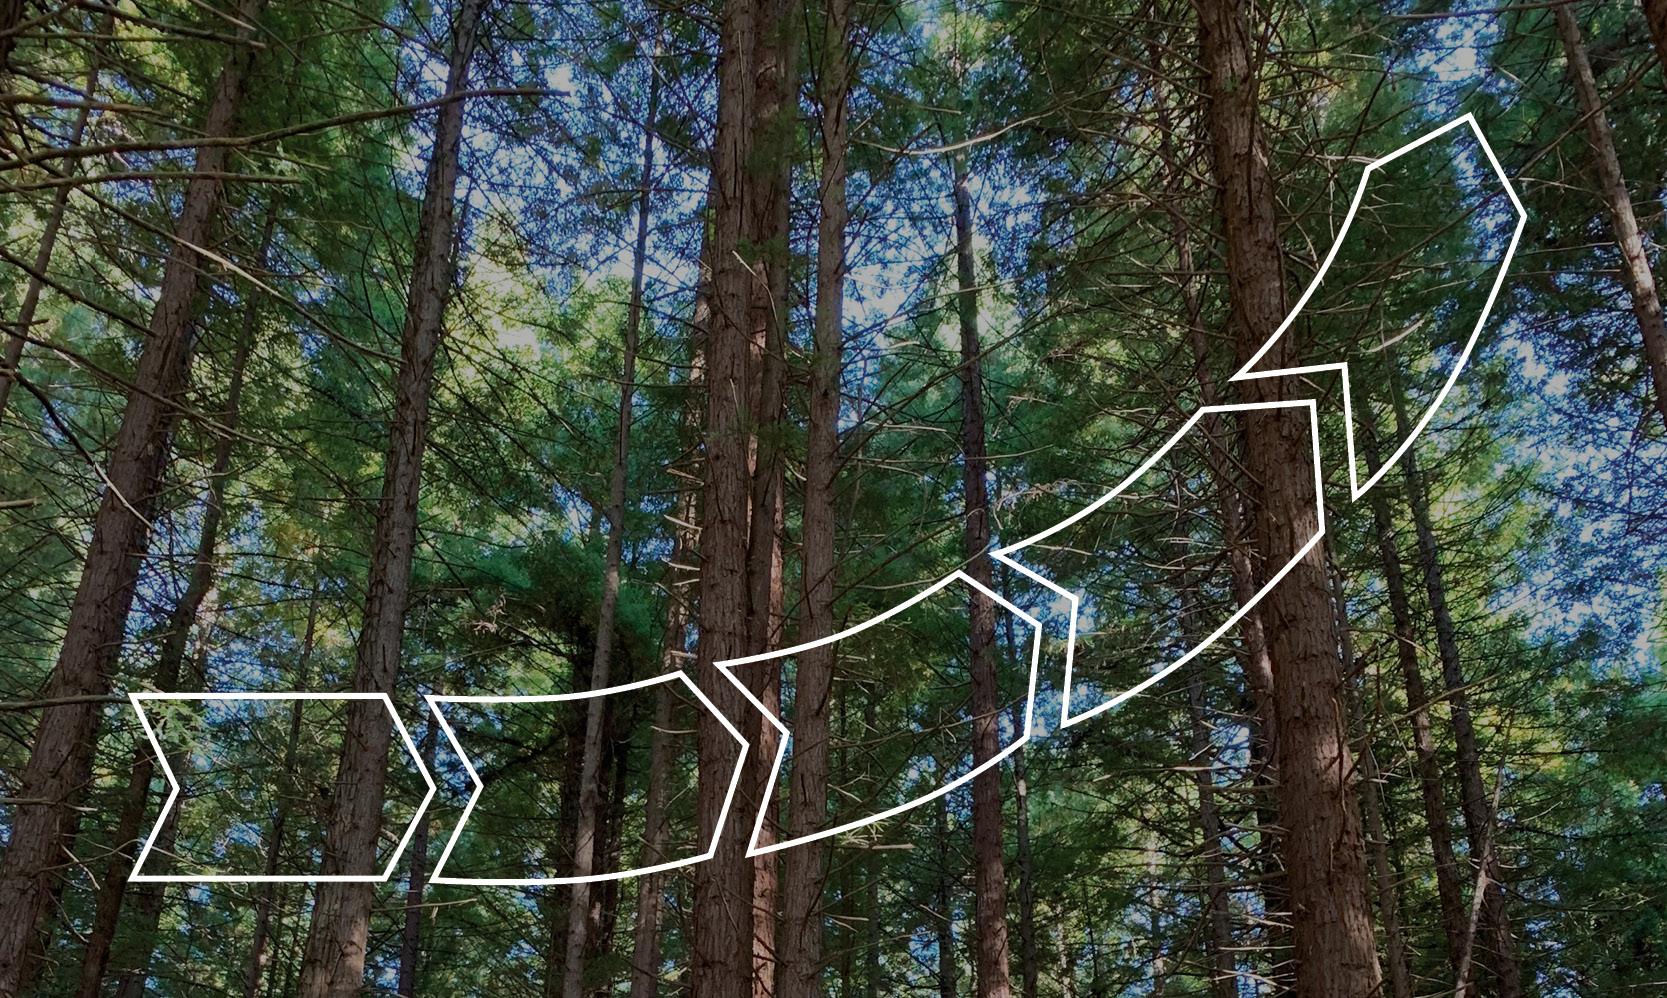 otmetka-partner-forest-growers-research-fgr-new-zealand-illustration-2020